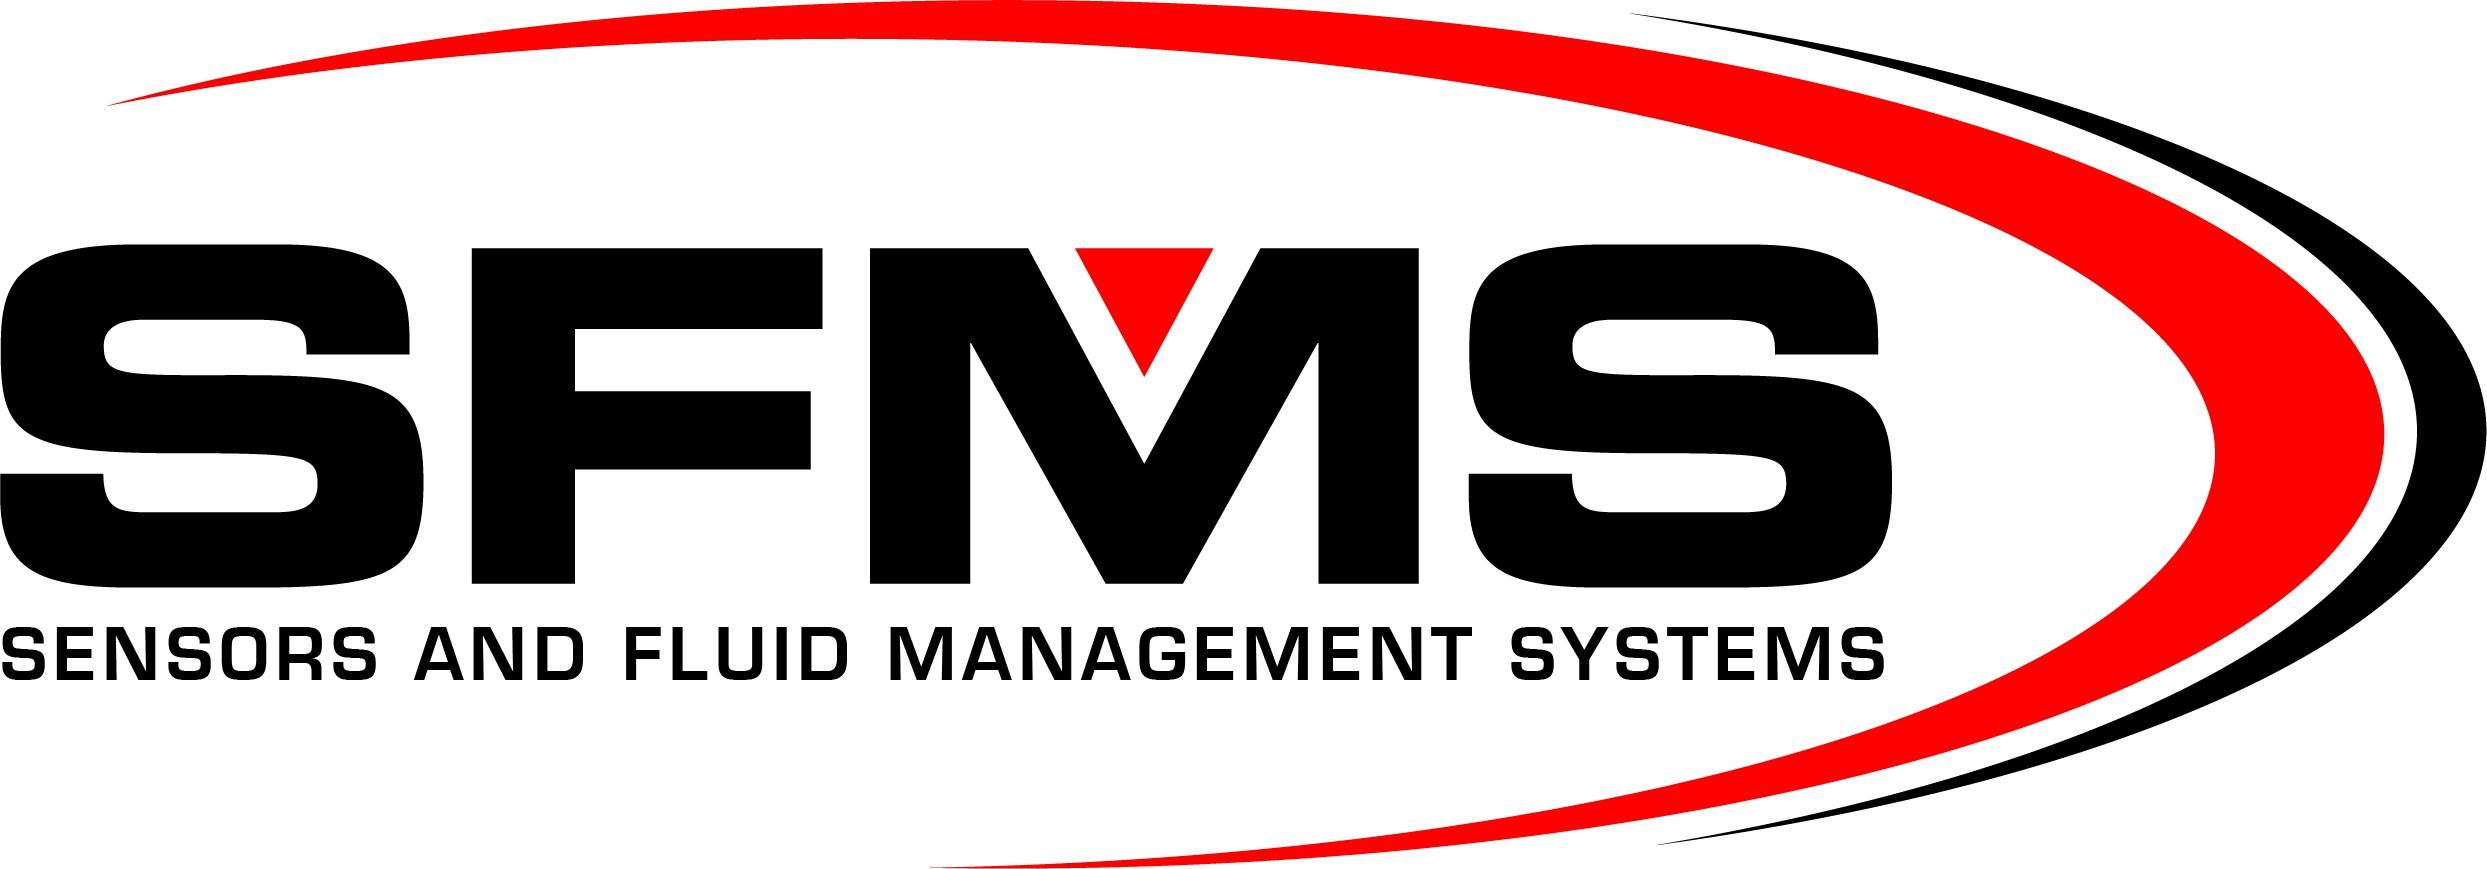 Design a logo for an aerospace component supplier